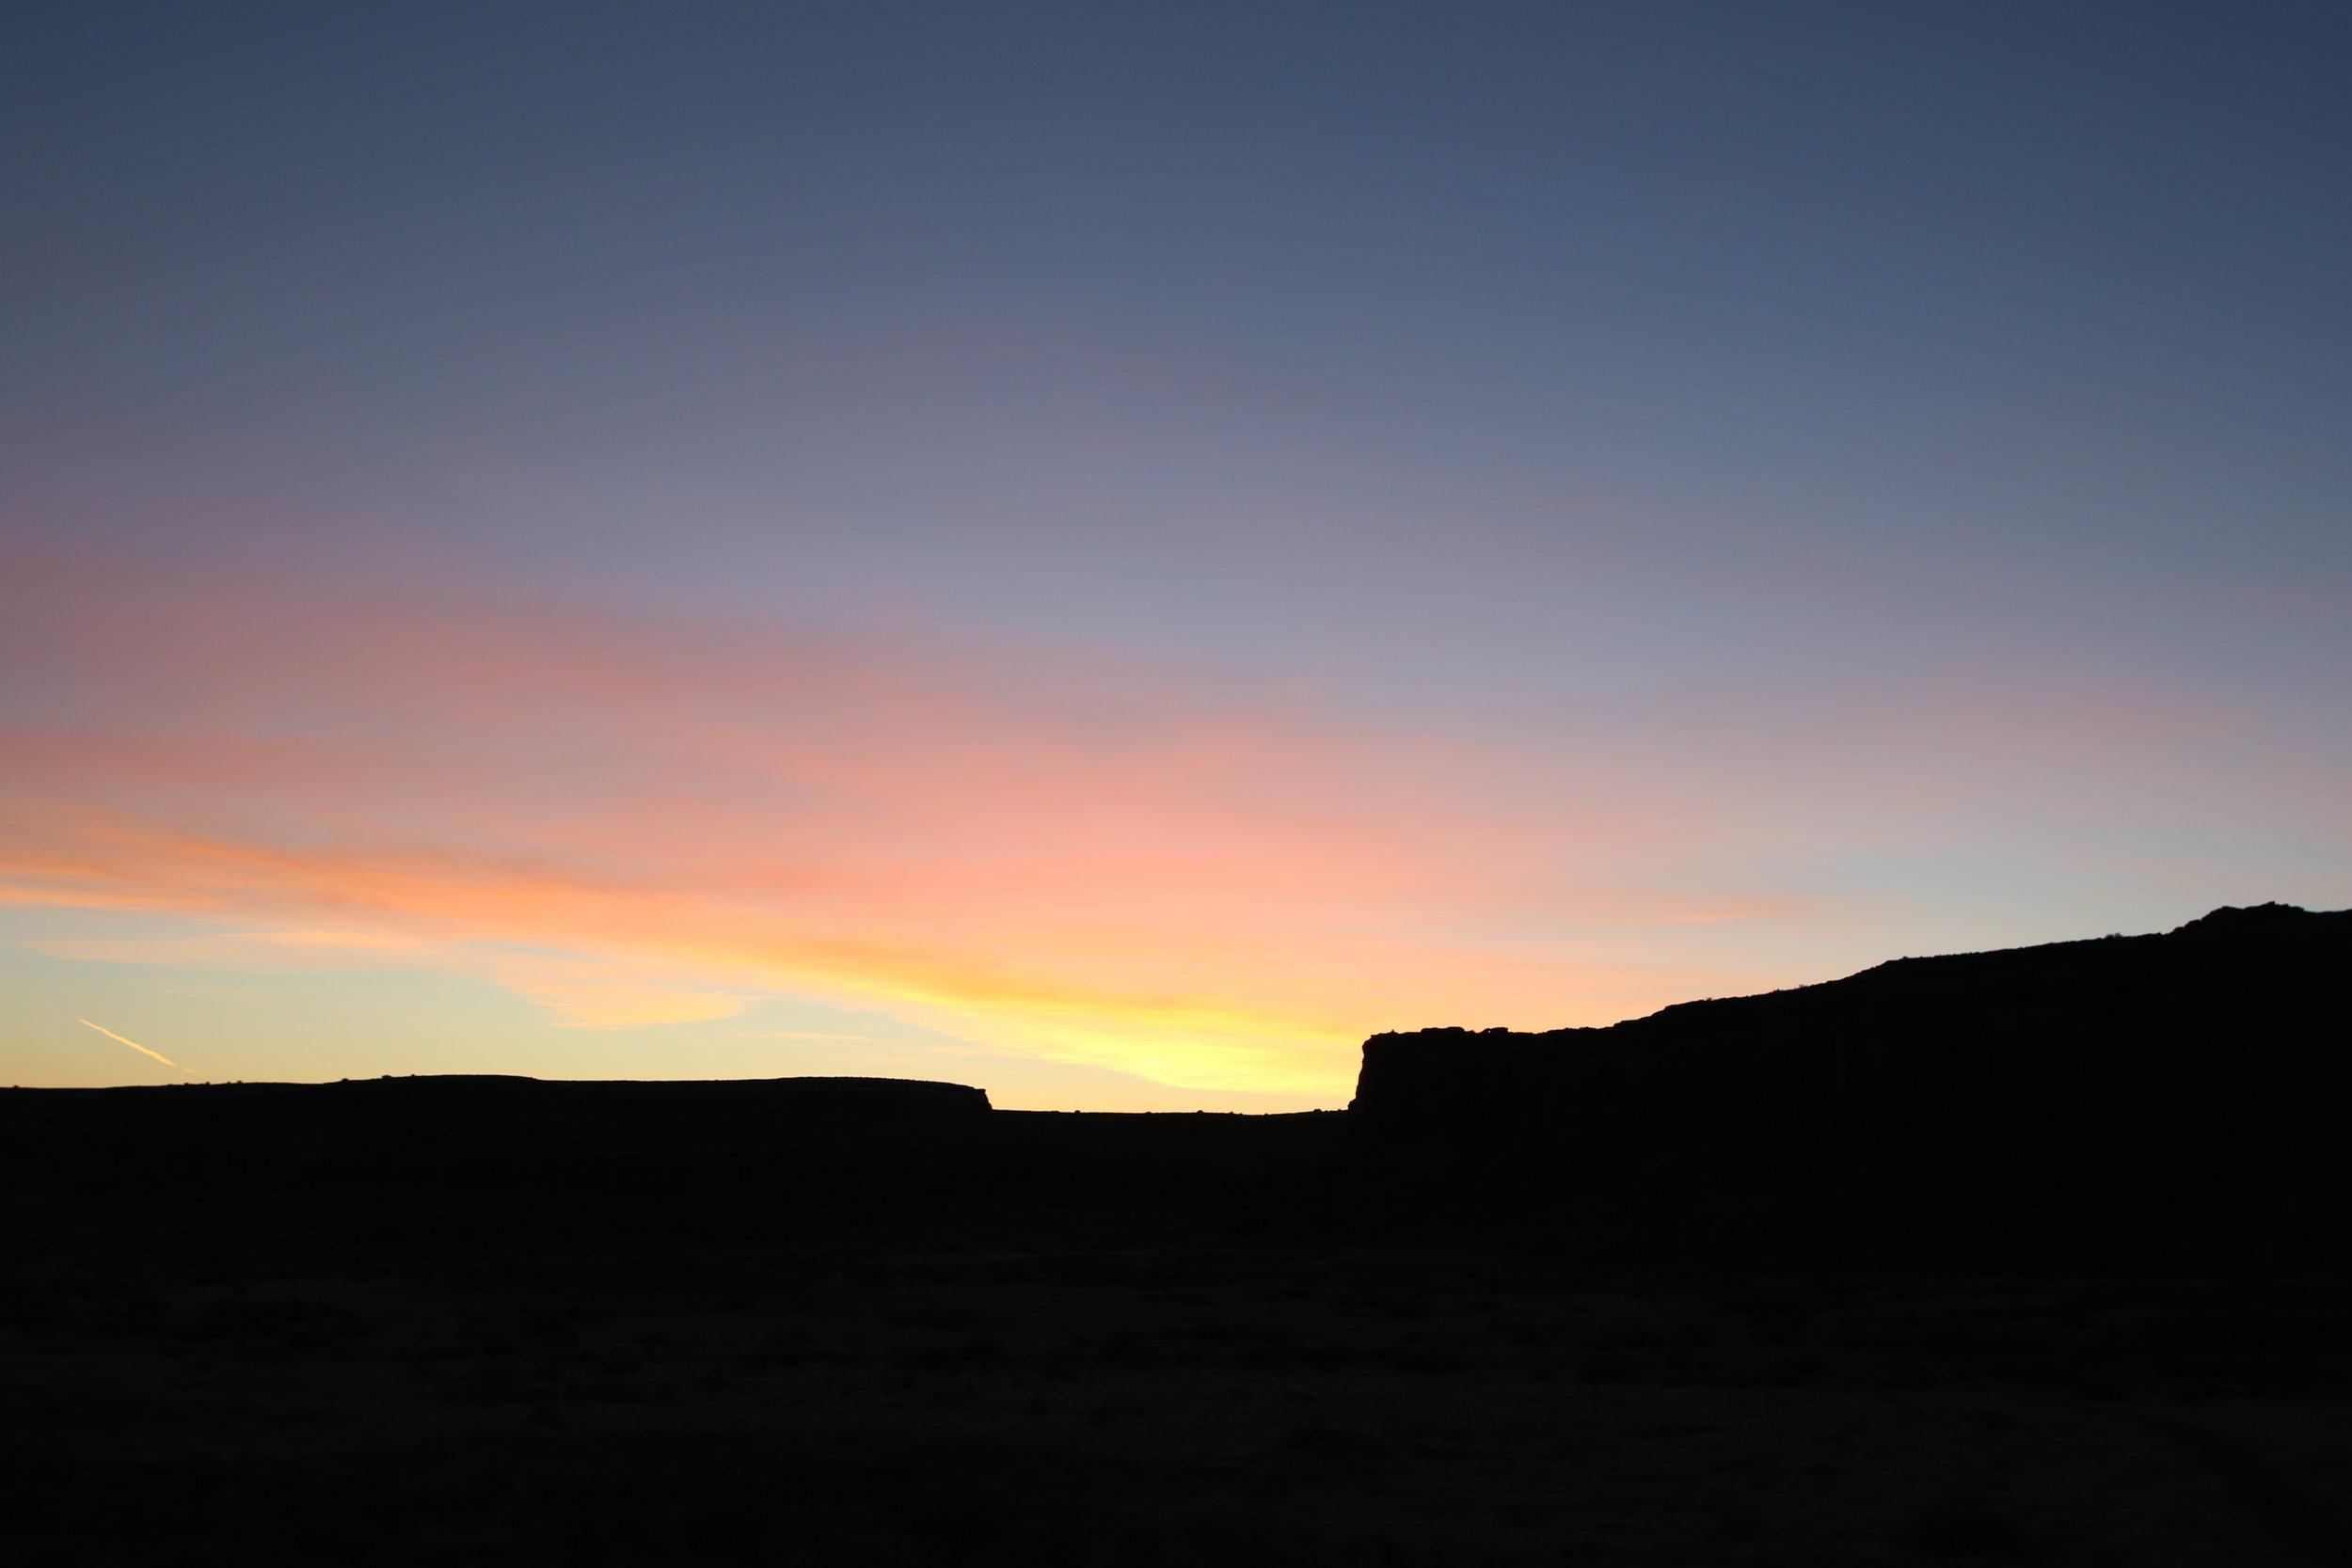 Spring Equinox Sunrise at Chaco - Rebecca Mir Grady